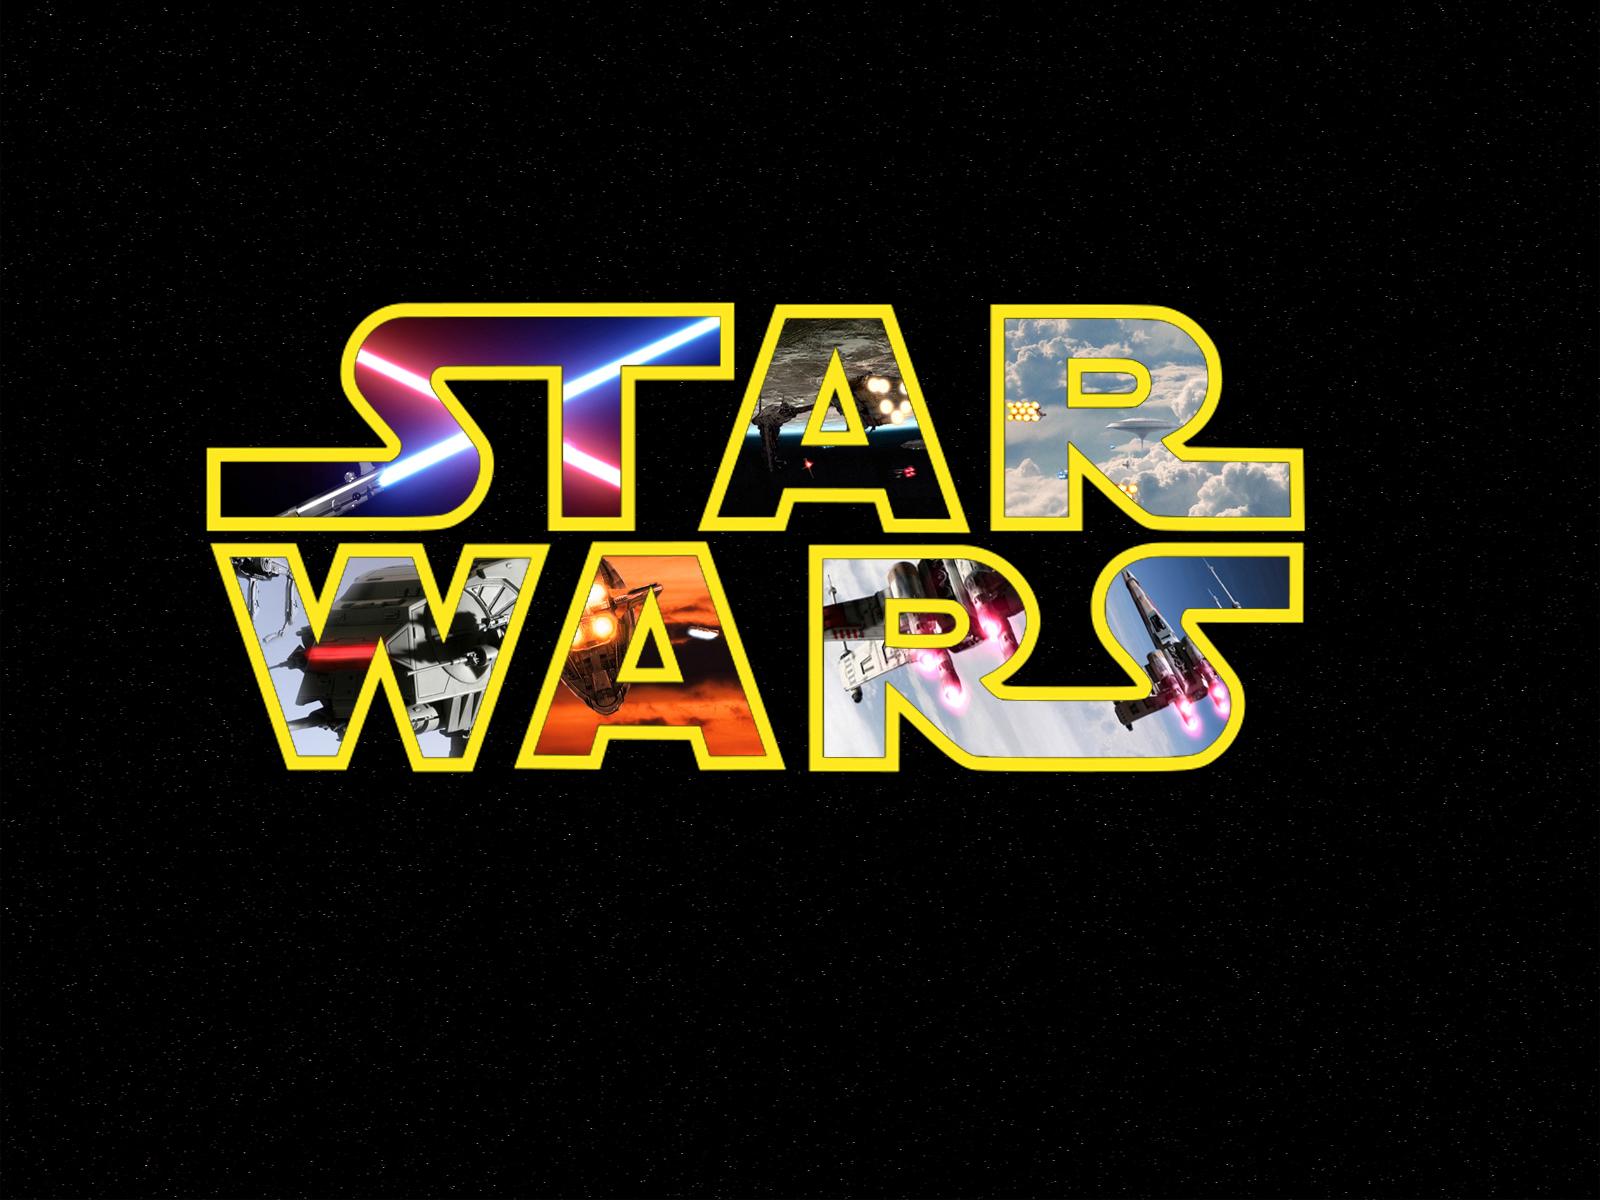 Star Wars Logo Wallpapers 2 1600x1200